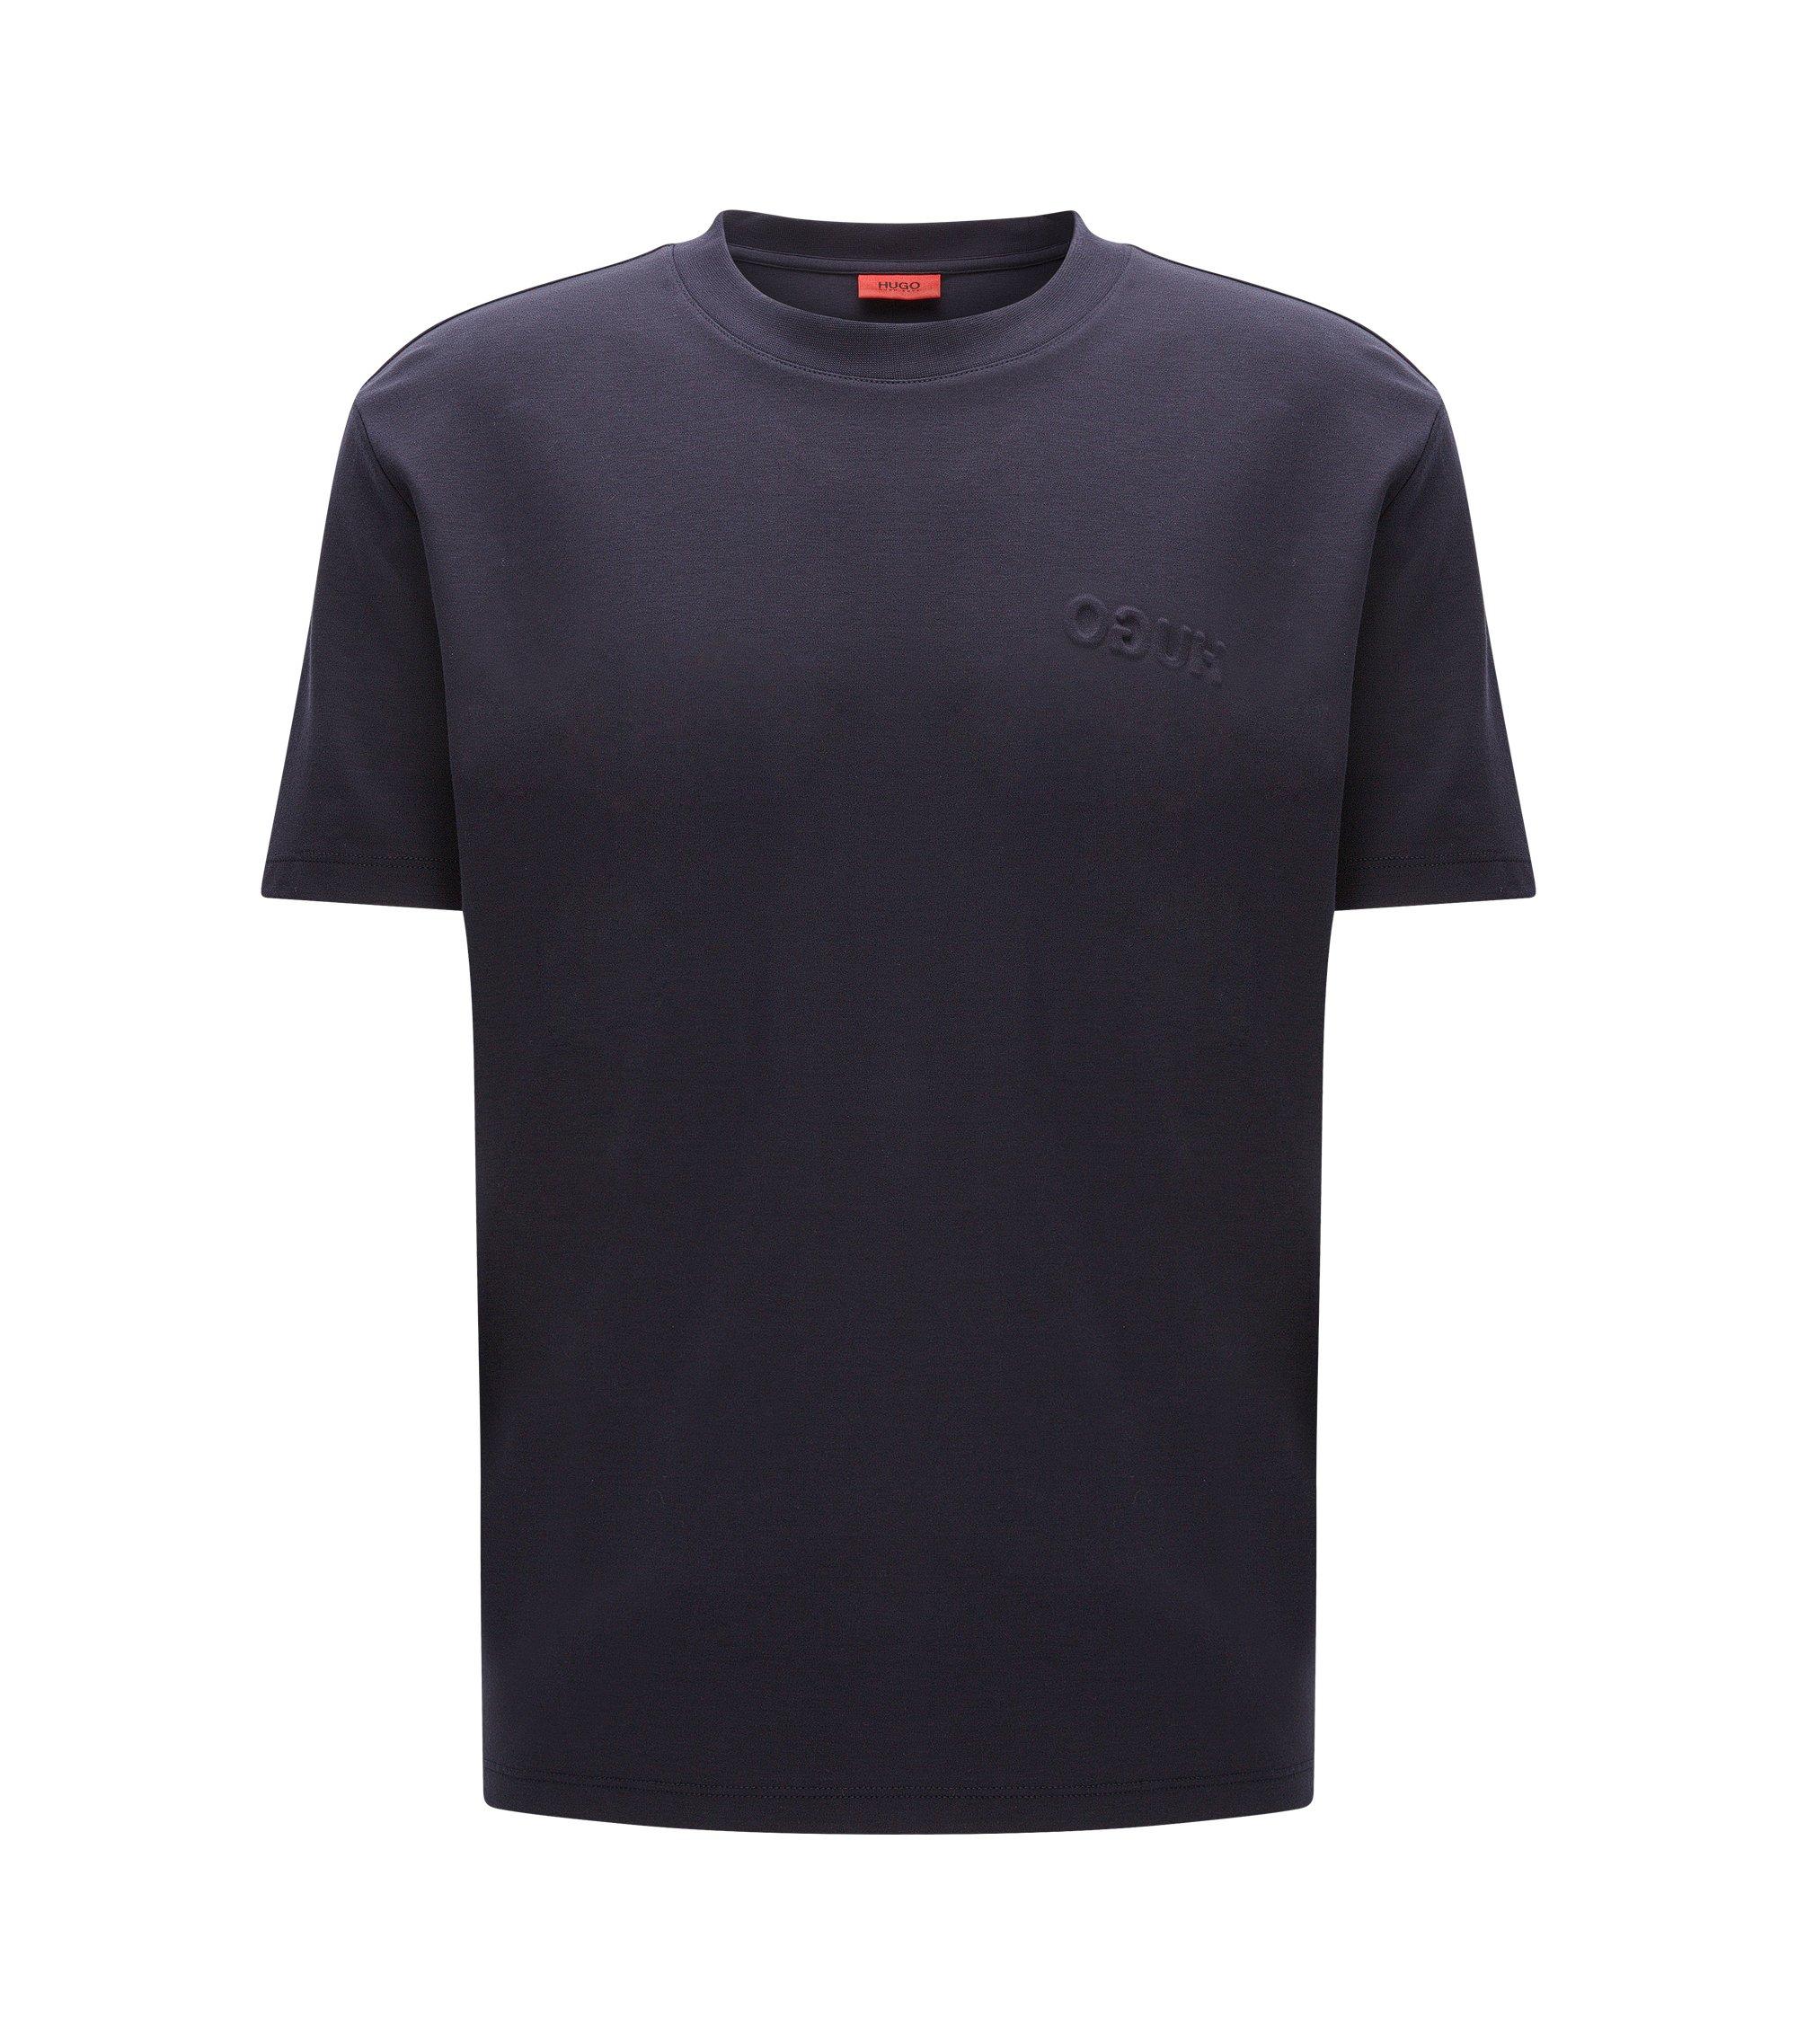 Oversize Shirt aus Pima-Baumwolle, Dunkelblau